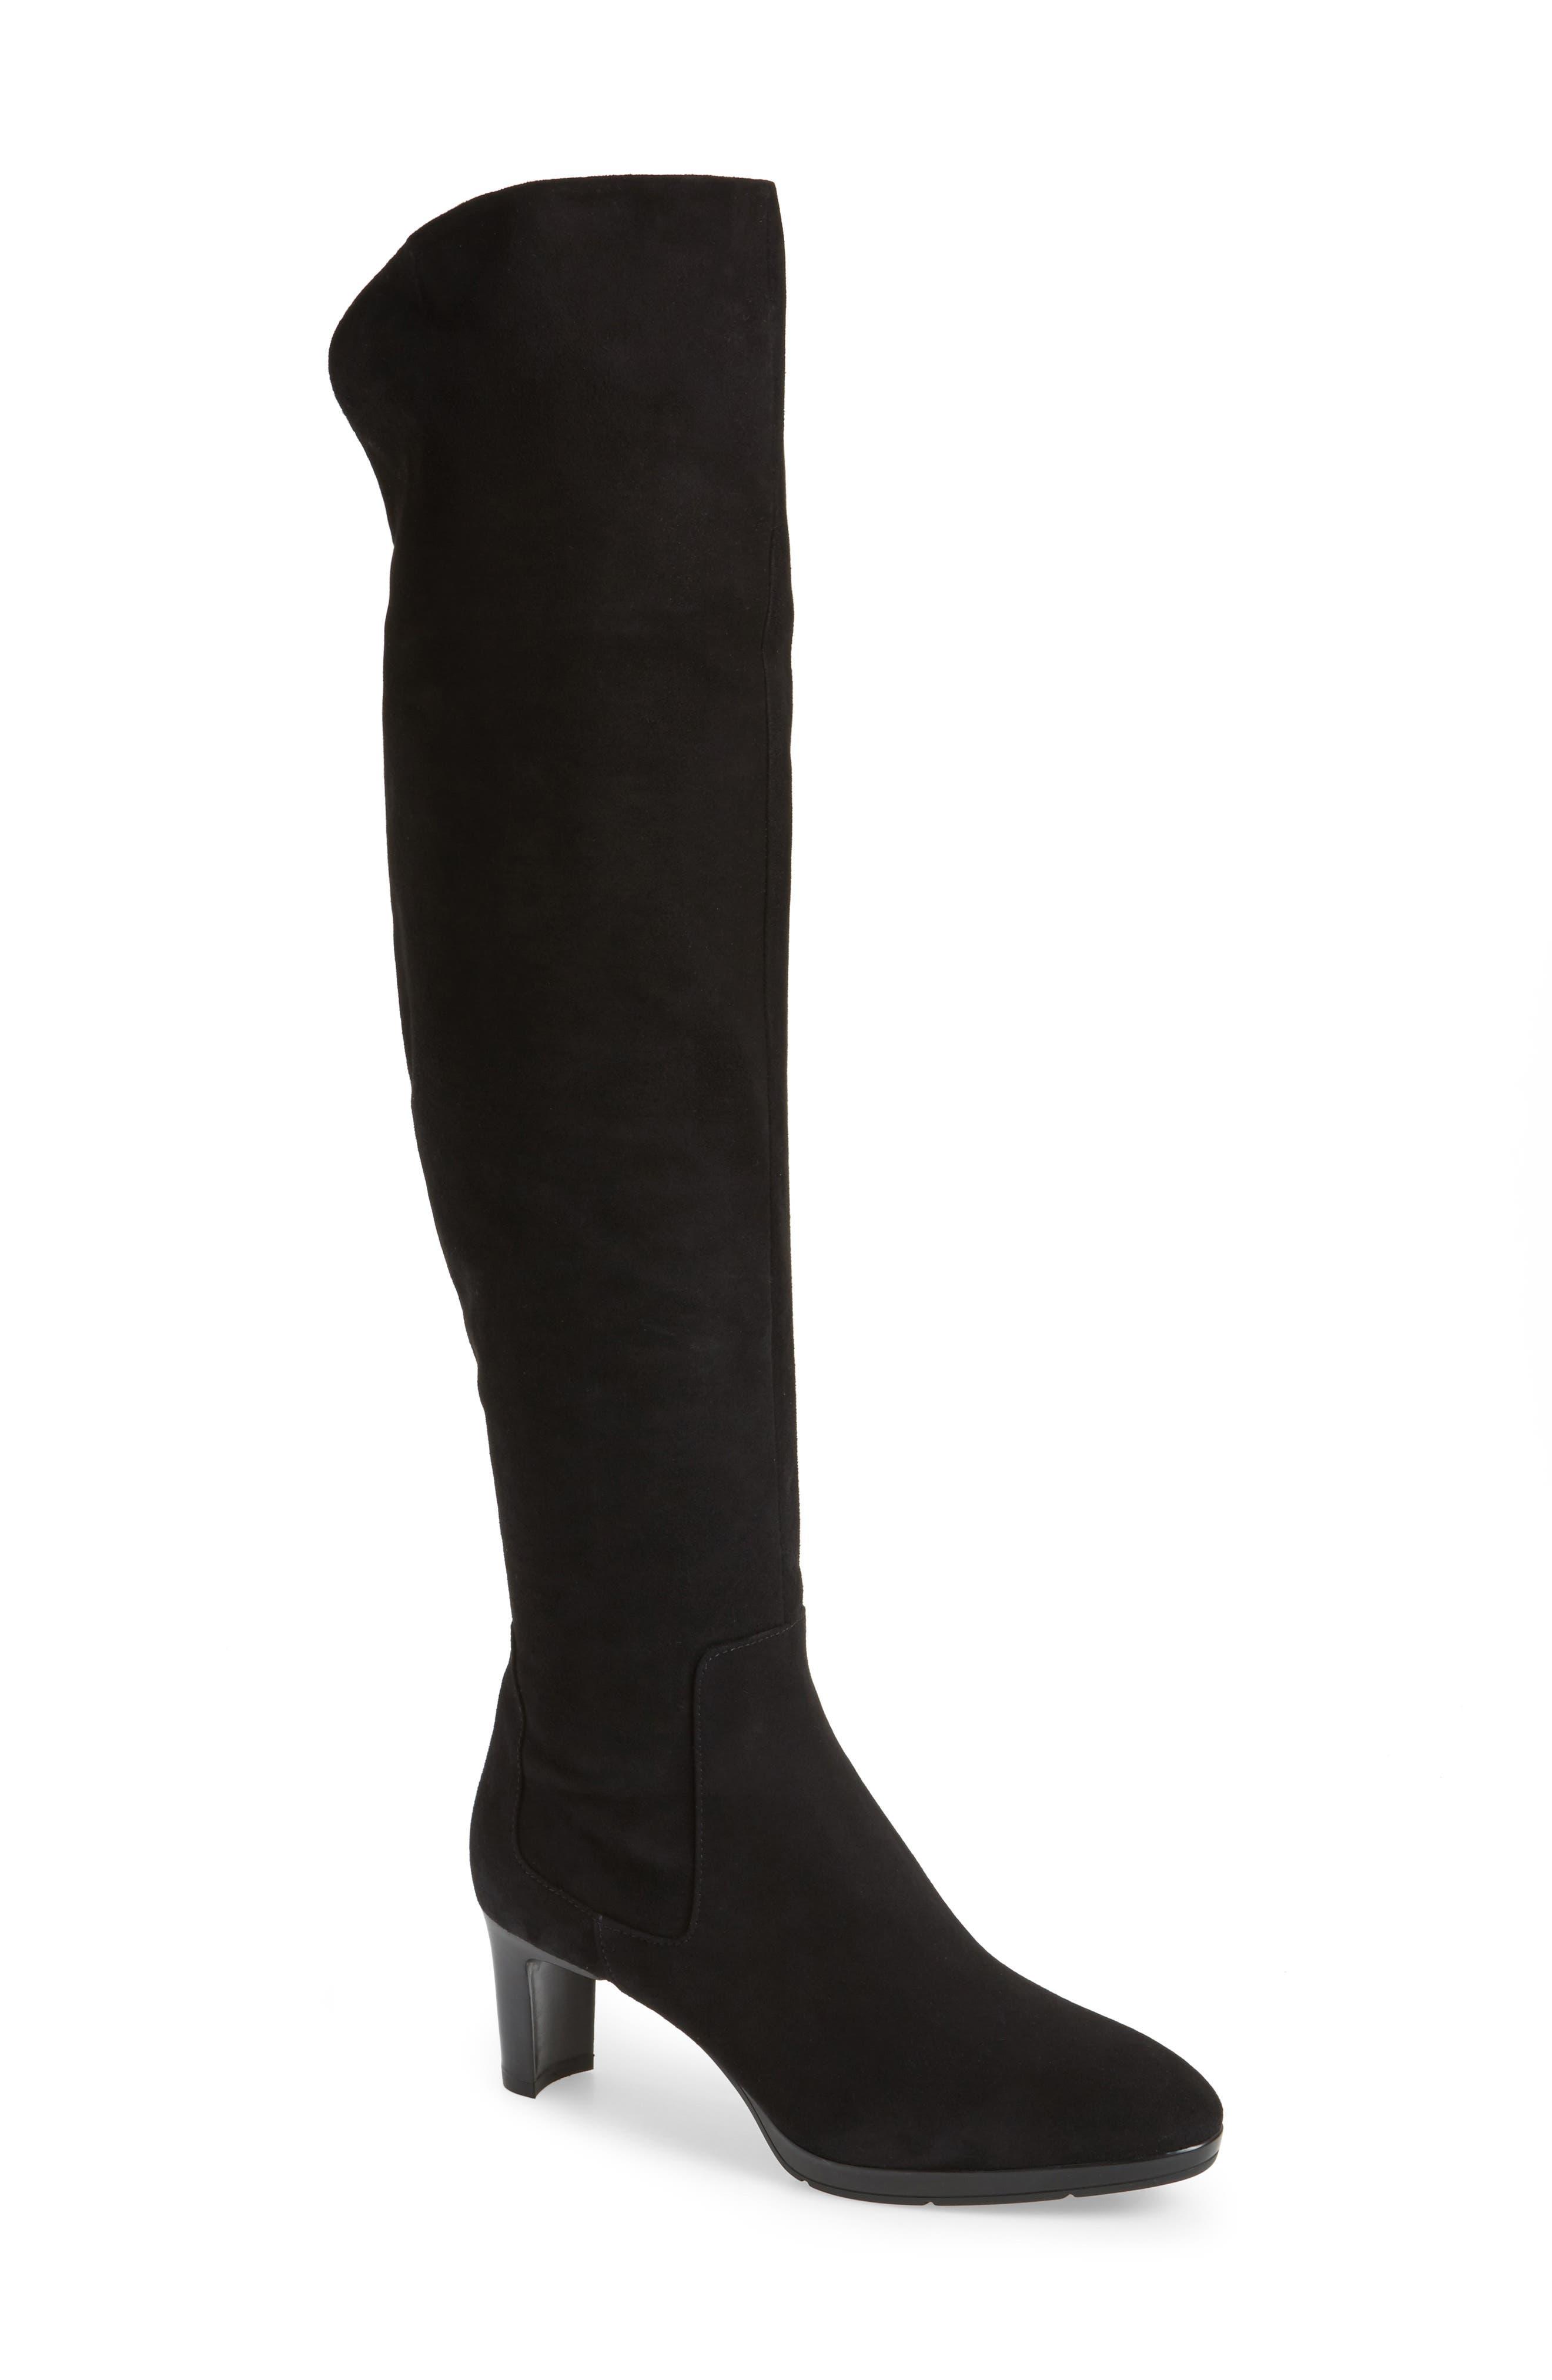 Main Image - Aquatalia Danika Weatherproof Over-the-Knee Boot (Women)